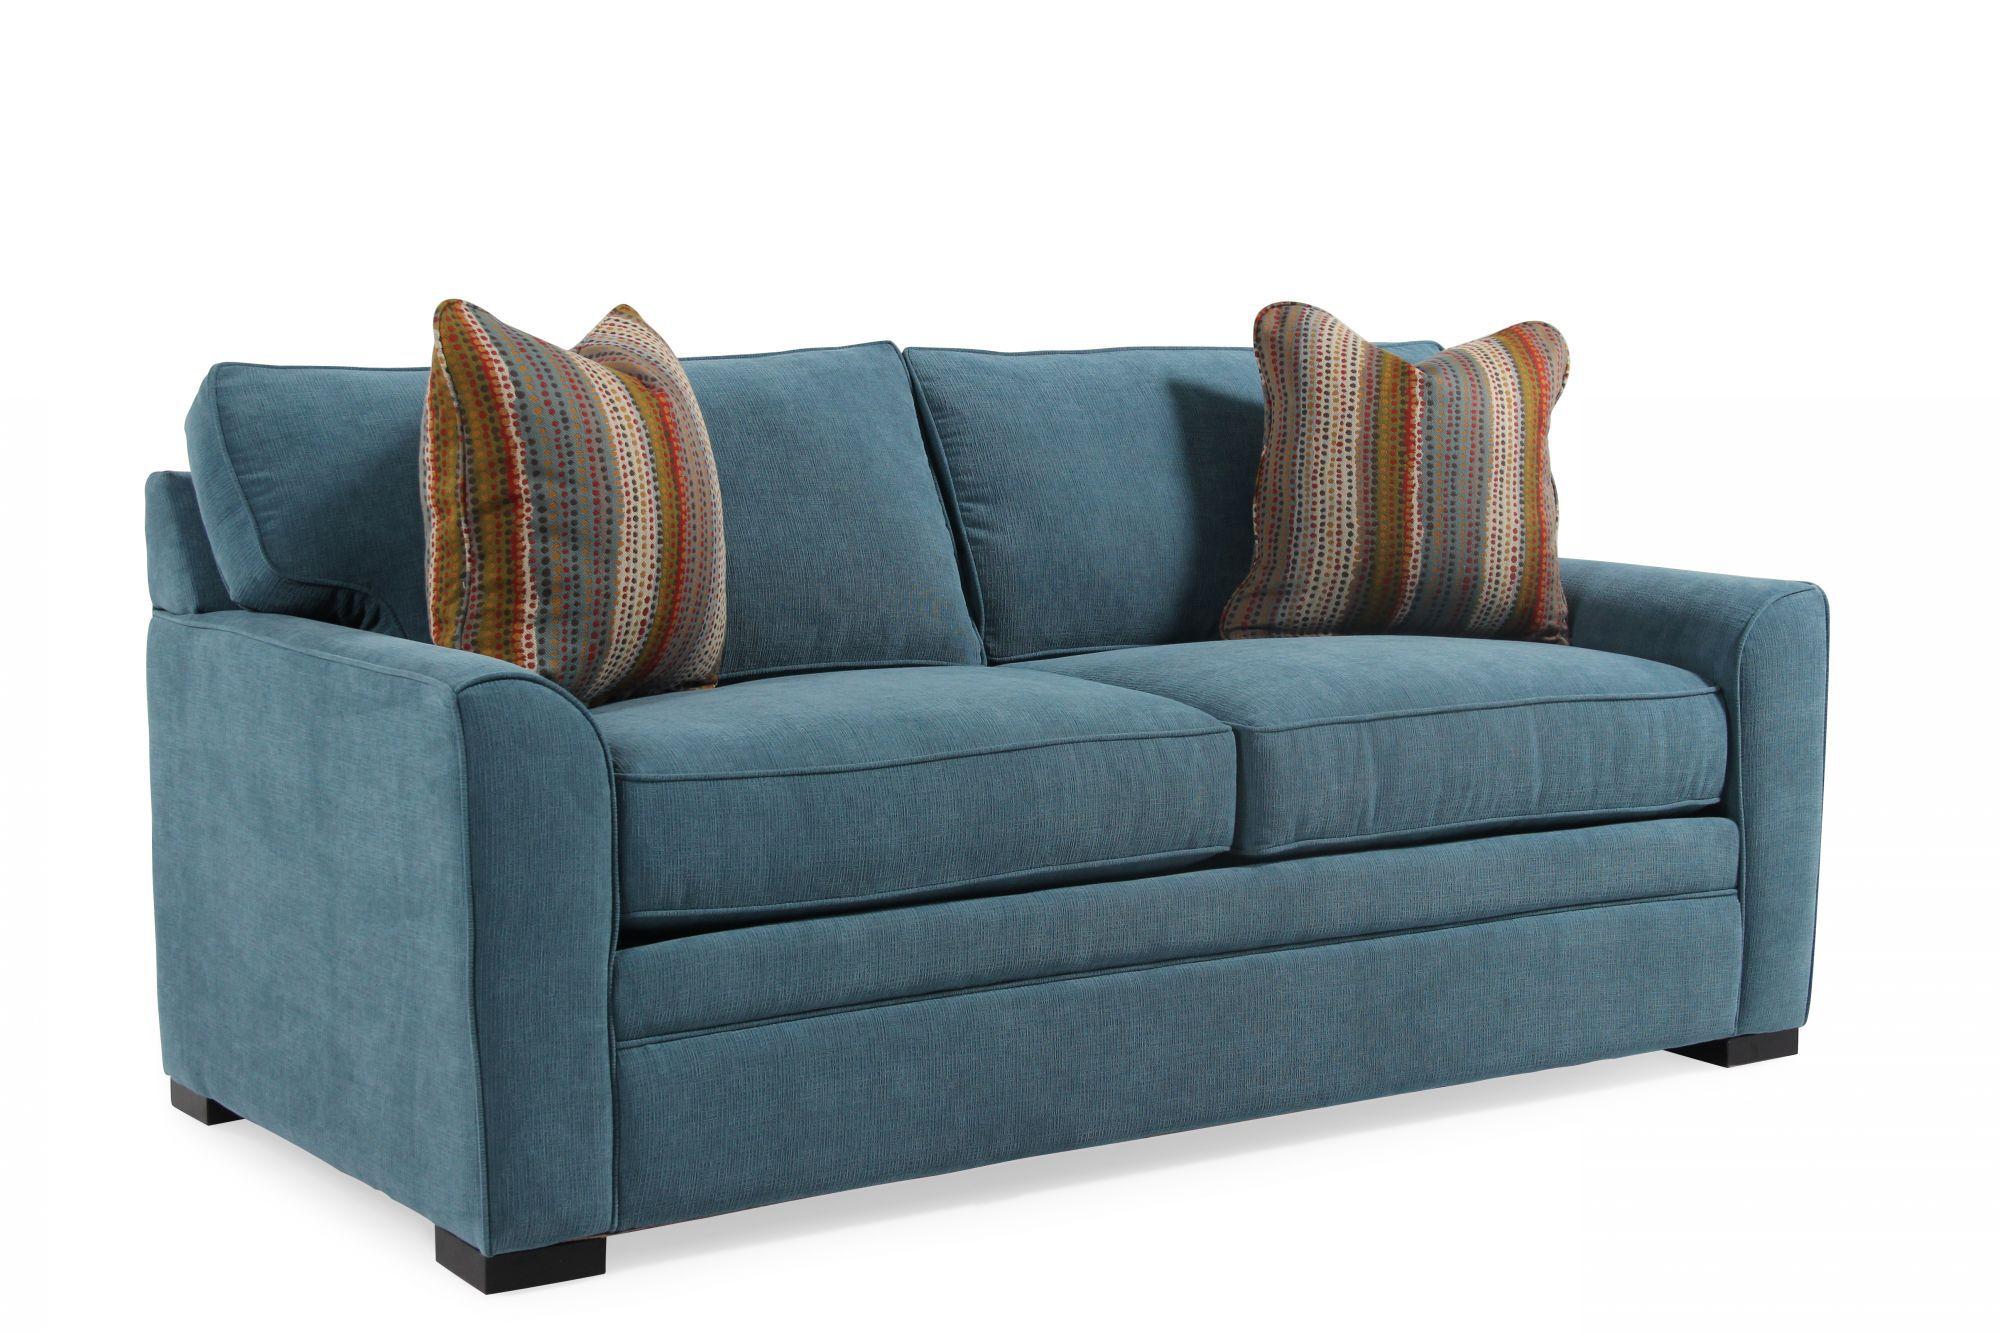 sh memory foam sleeper sofa mattress simple wooden set online jonathan louis blissful blue full